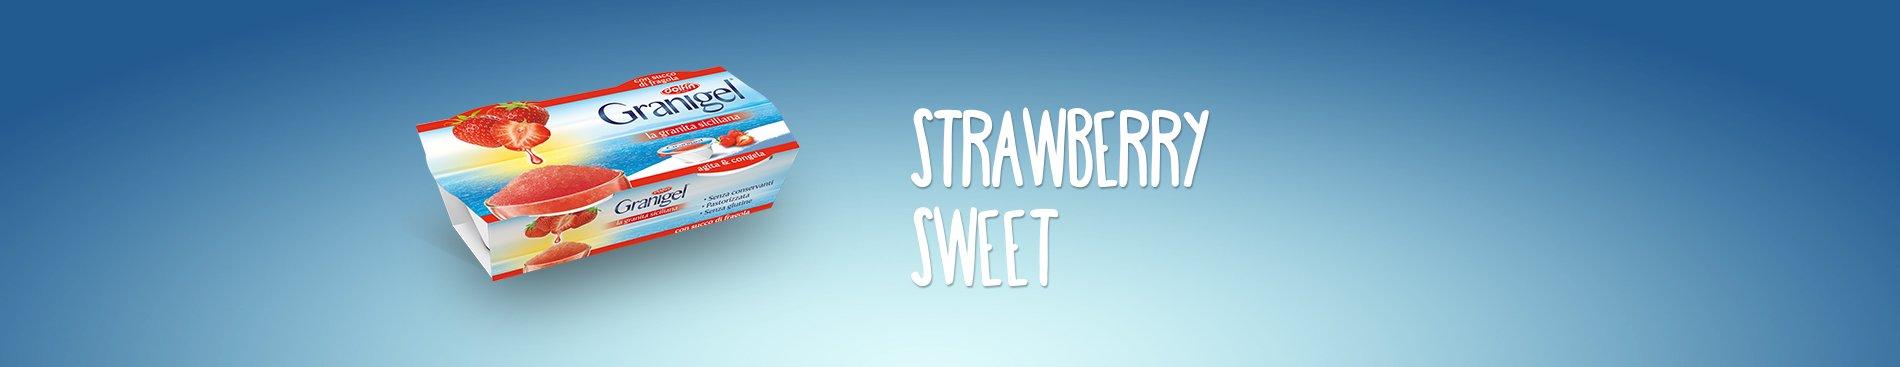 Granigel Strawberry